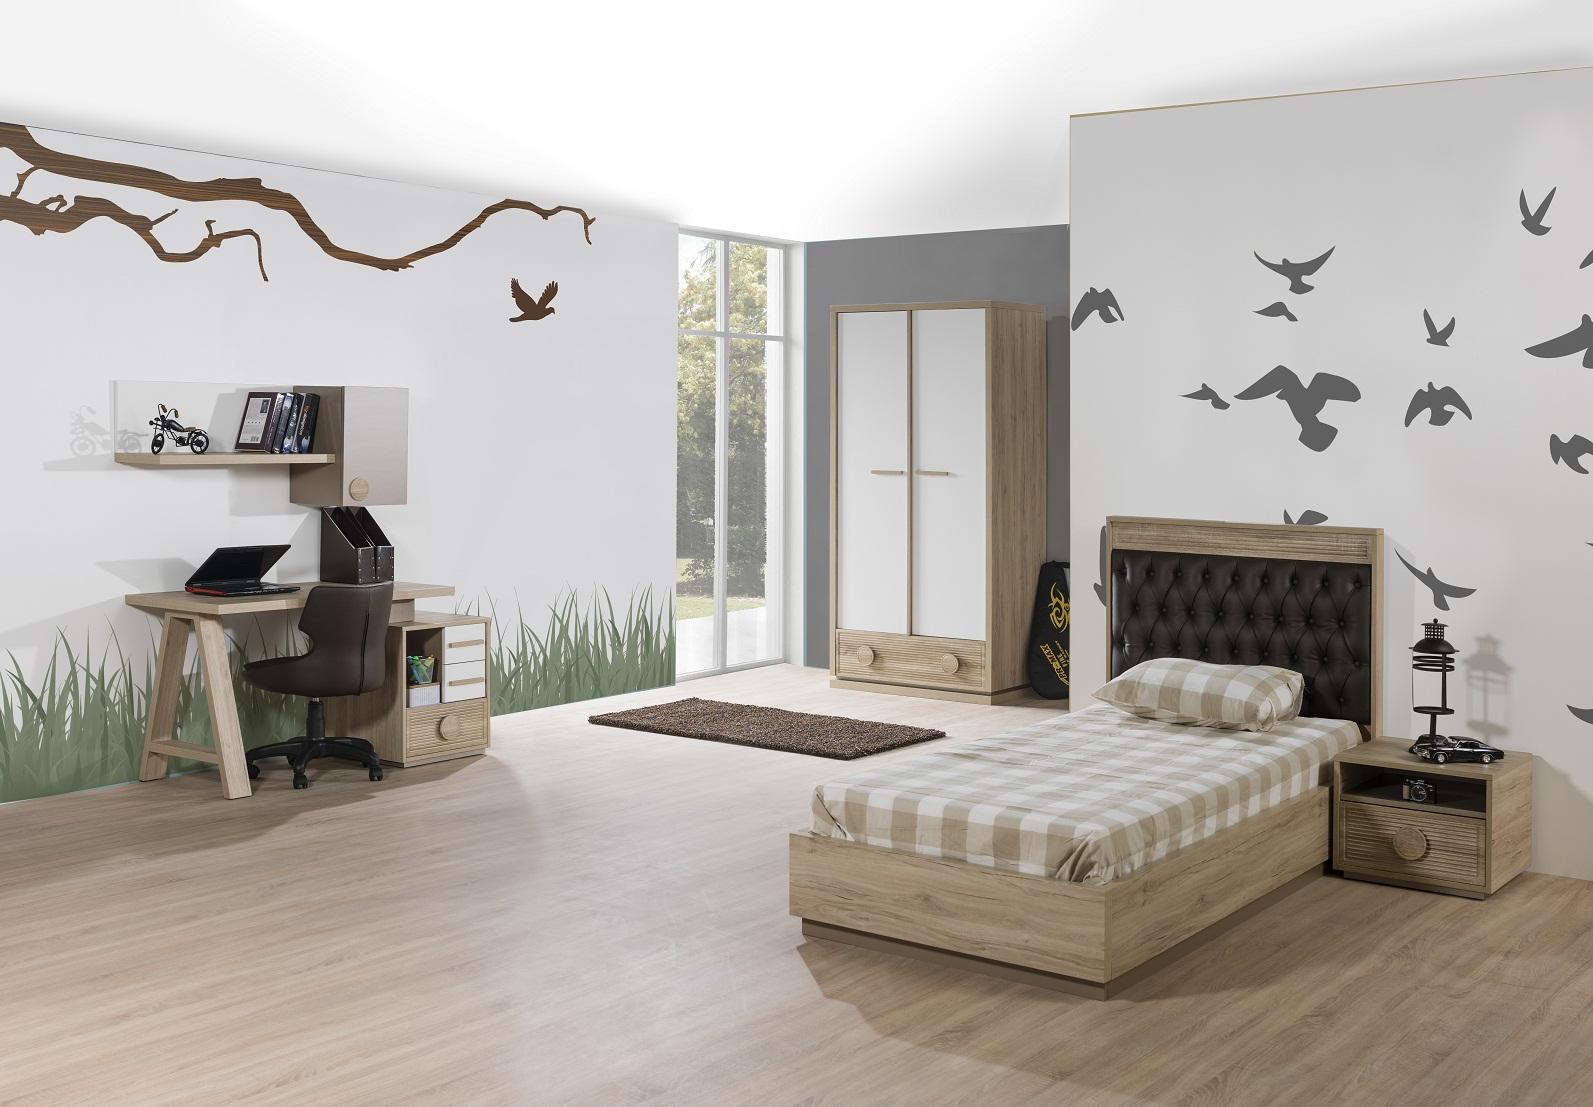 Kinderzimmer ALFA Bett 90x200 Cm Natur Braun Weiss Jugendzimmer 75004/2/8/14